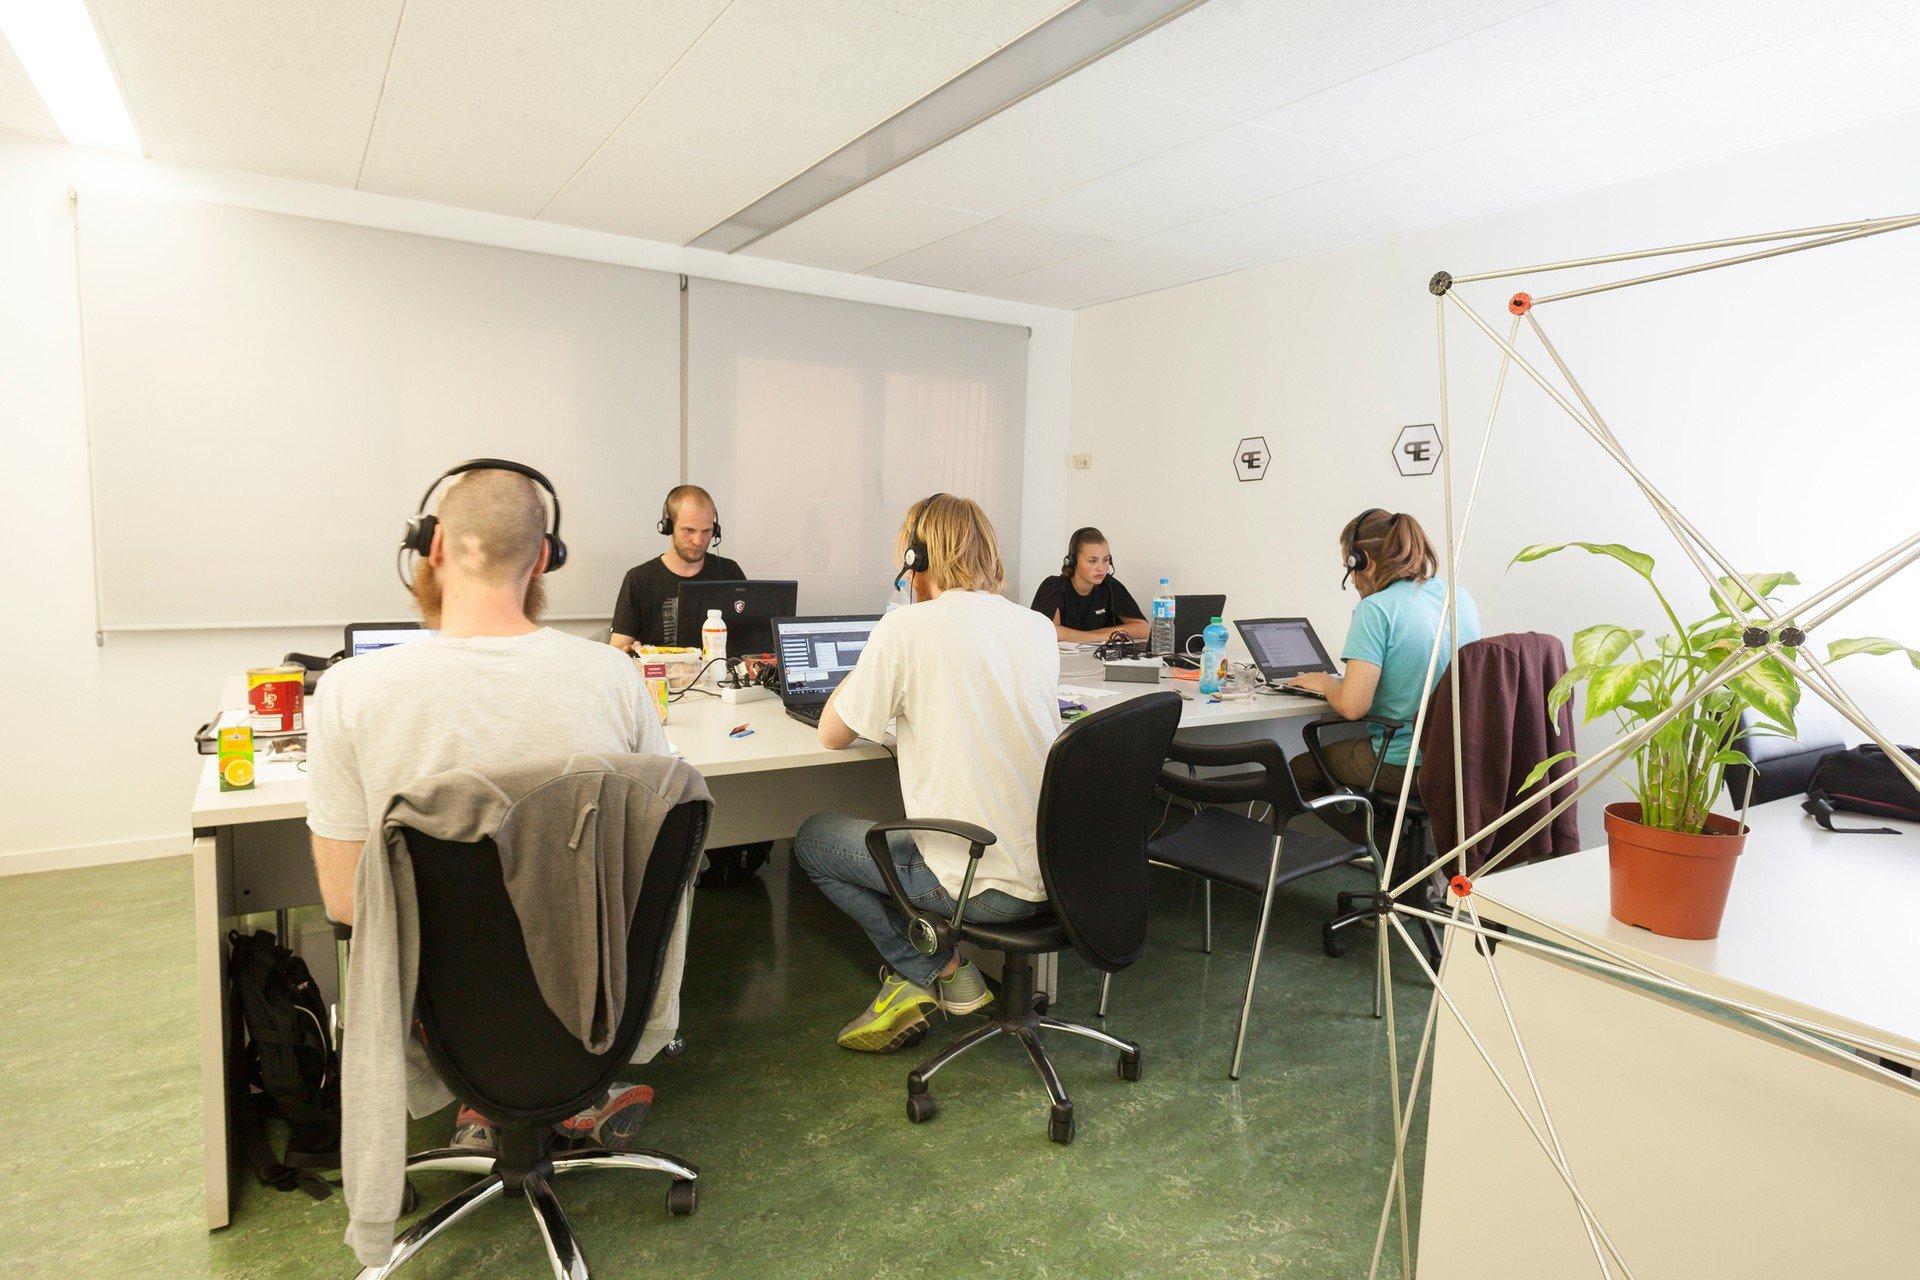 Barcelone training rooms Espace de Coworking Start2bee Travessera image 0